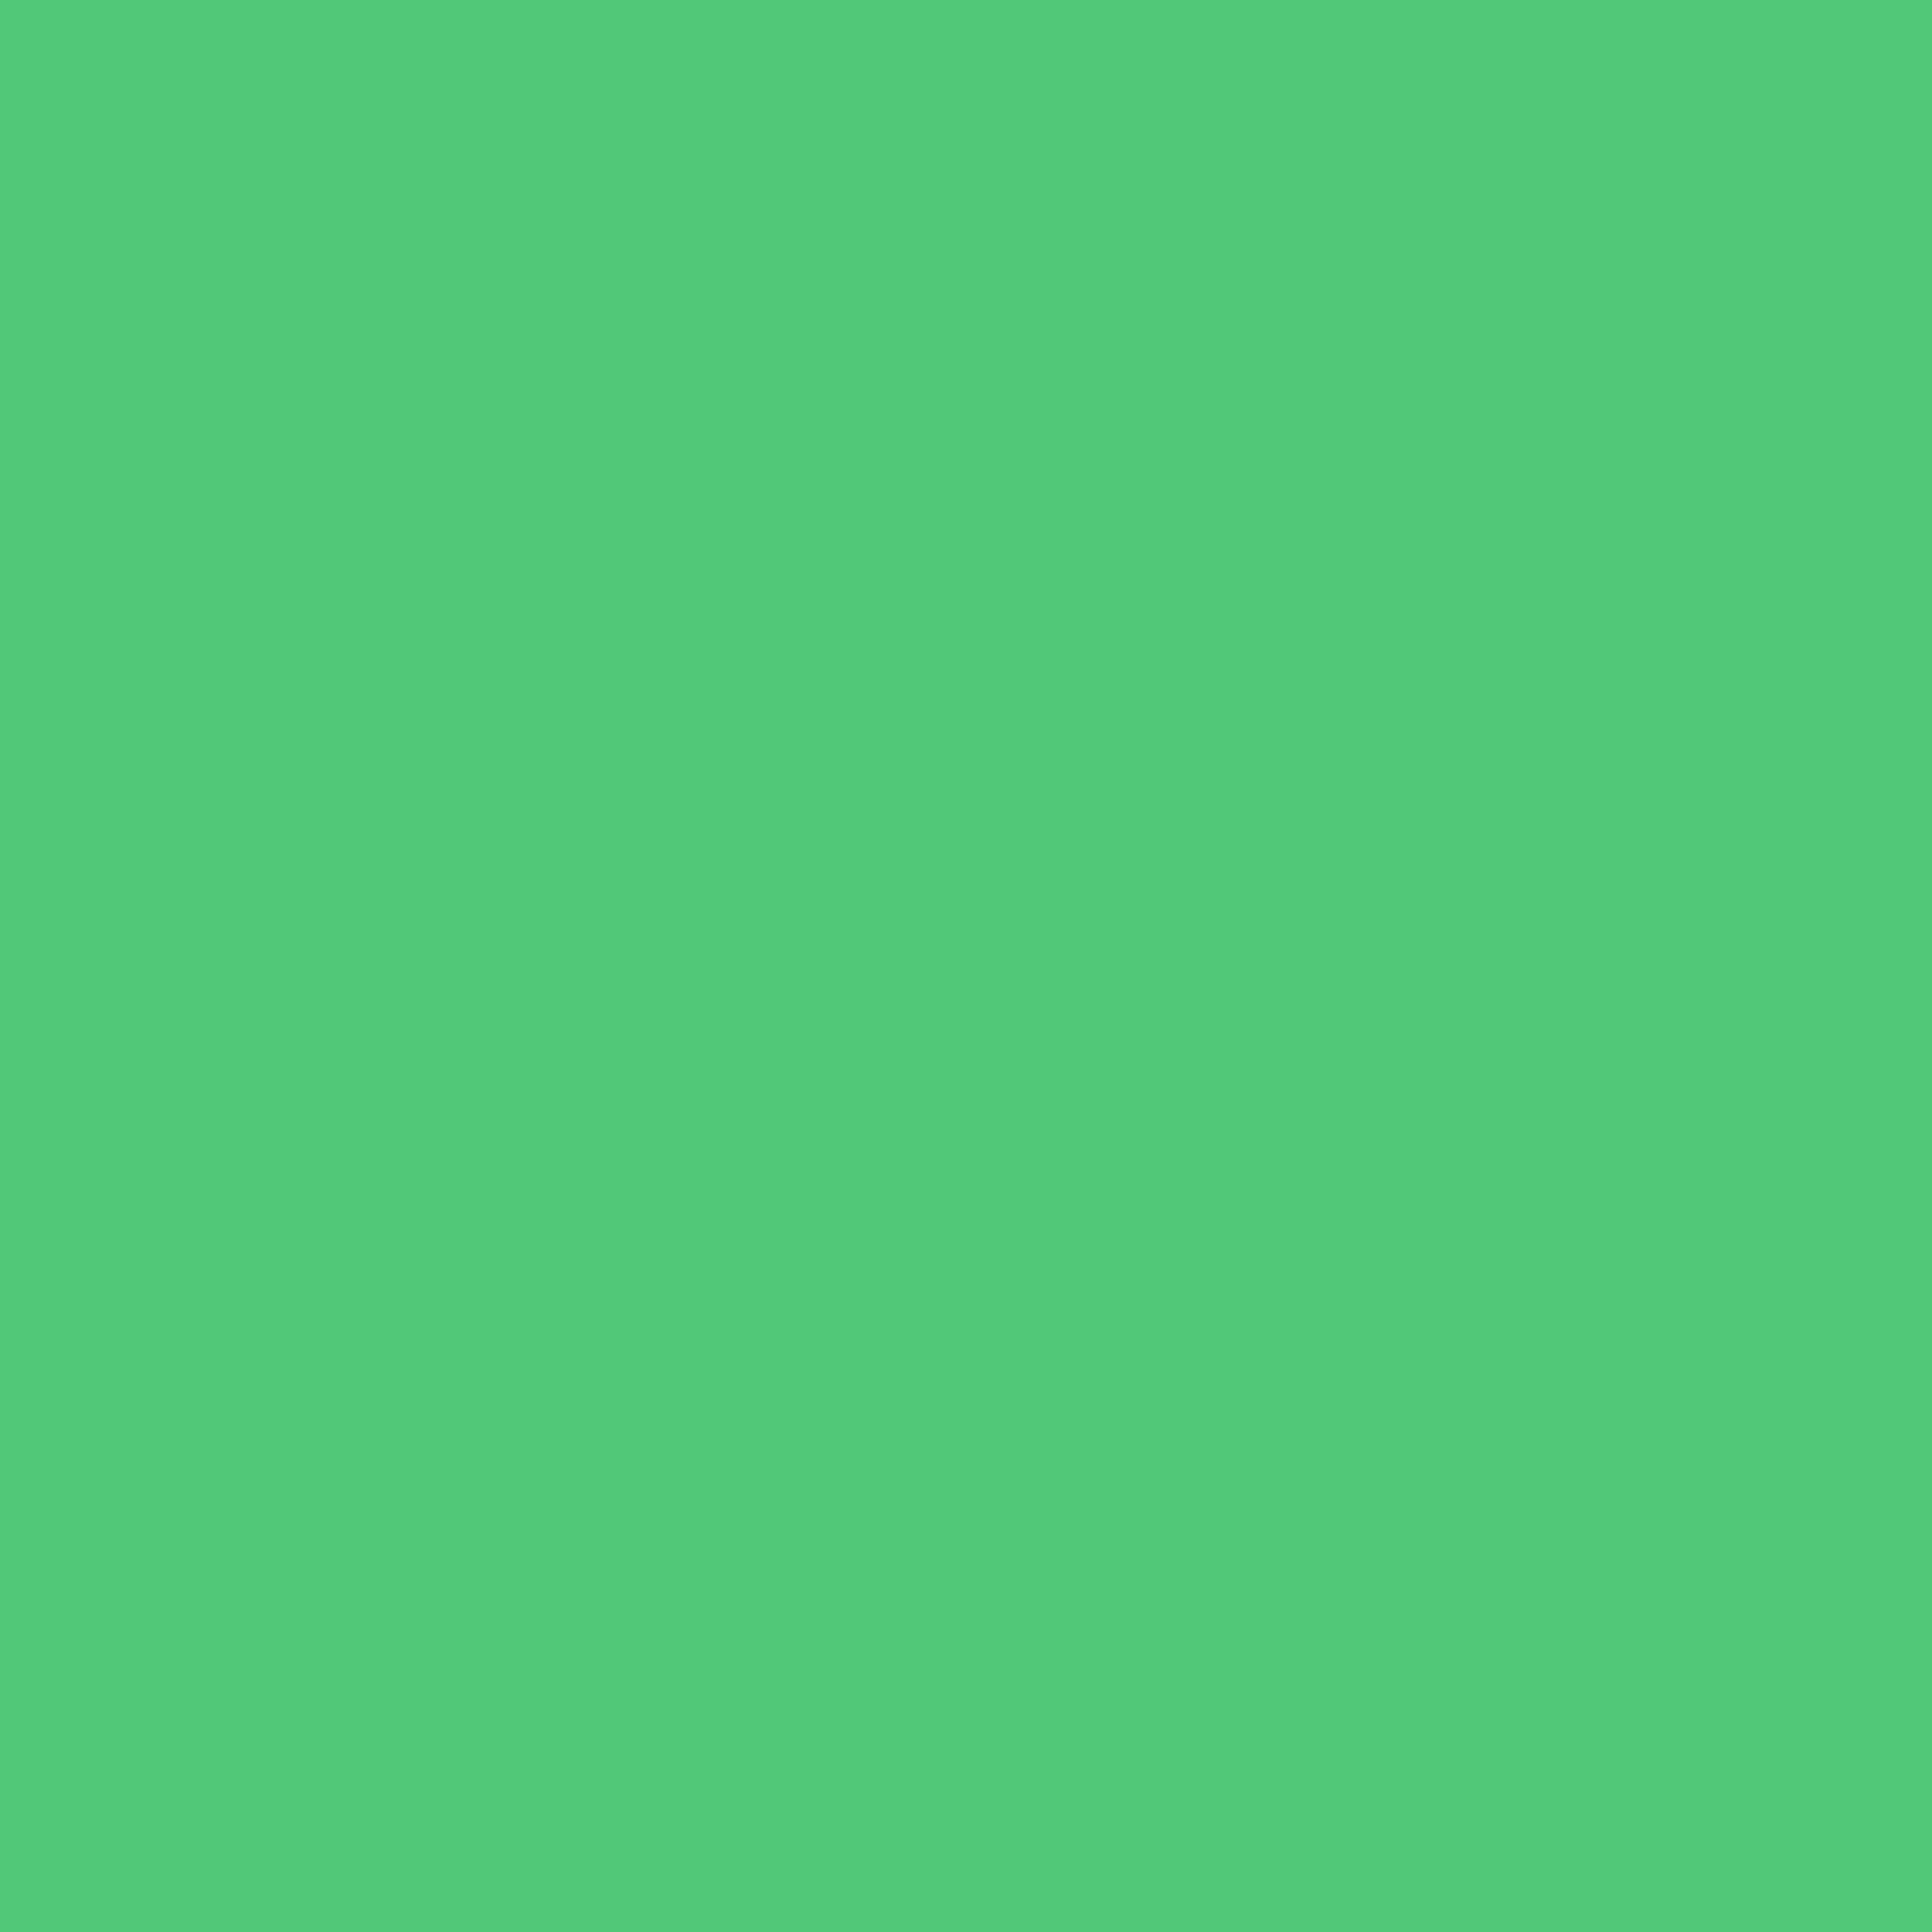 2732x2732 Paris Green Solid Color Background